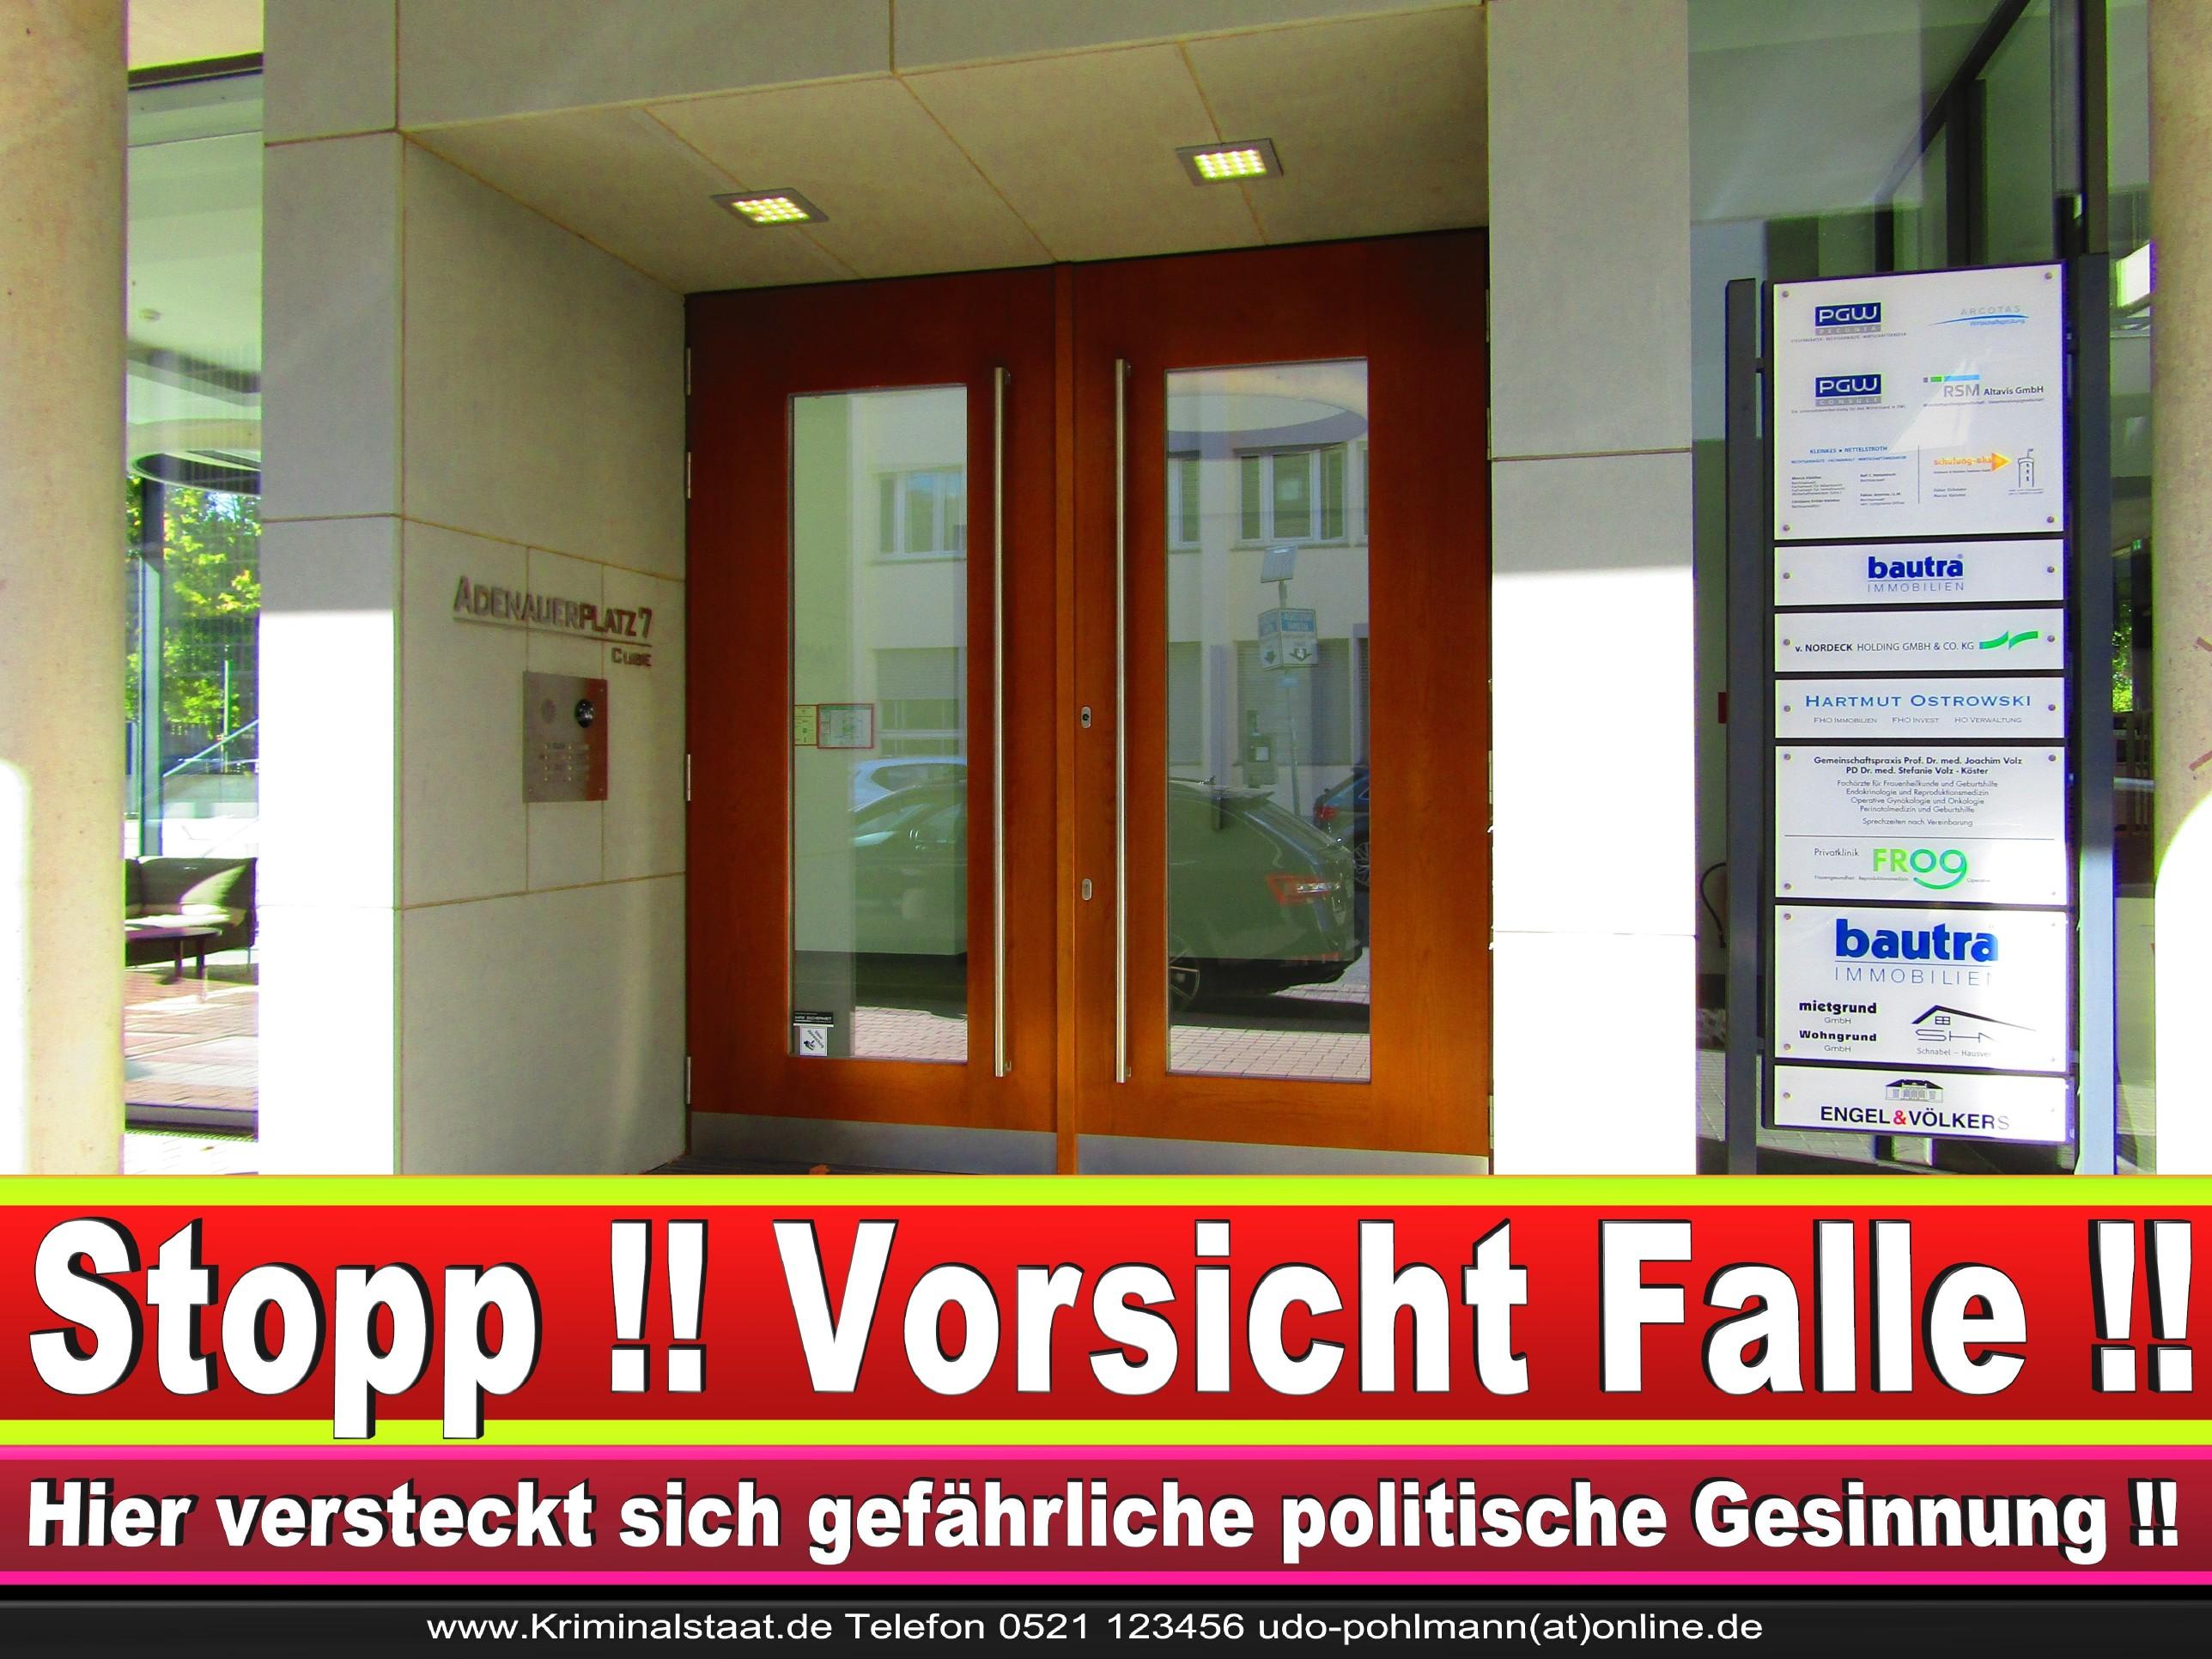 Rechtsanwalt Ralf Nettelstroth Adenauer Platz 7 Bielefeld CDU 4 Kopie